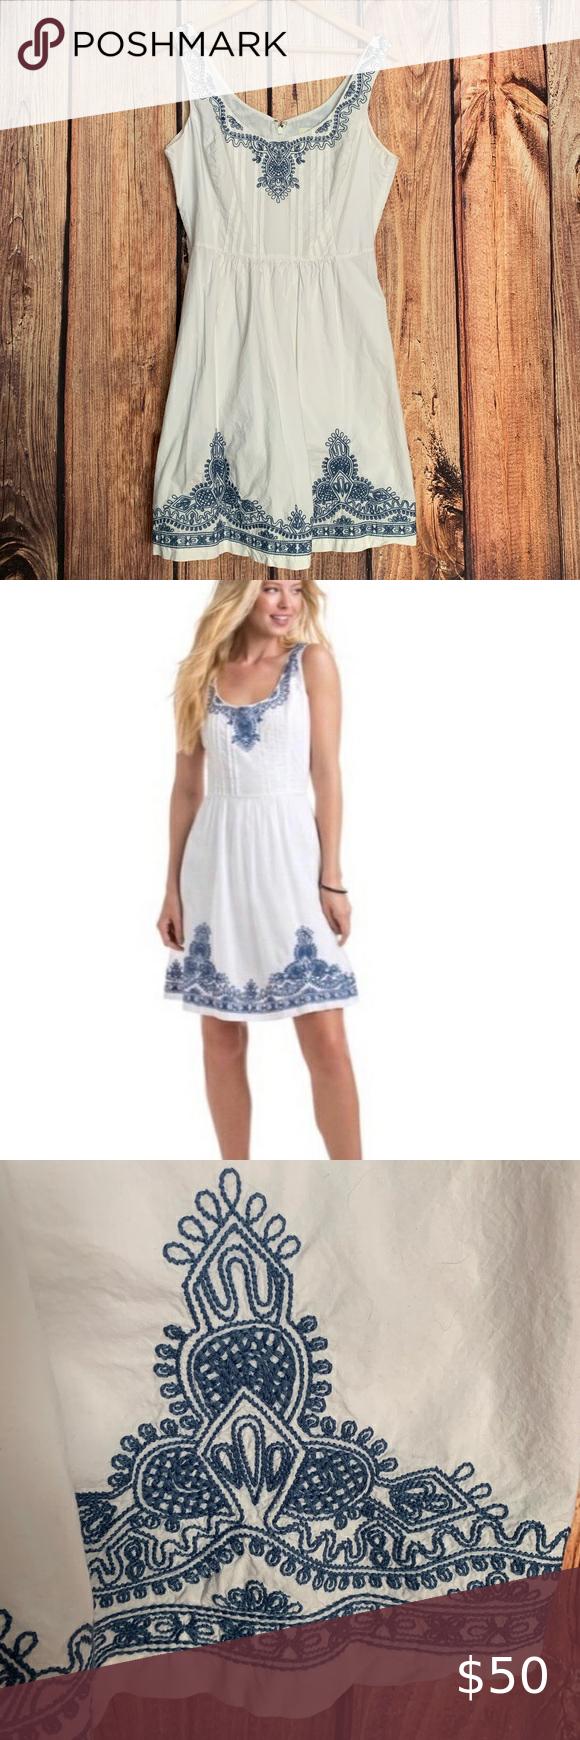 Vineyard Vines 100 Cotton Dress With Embroidery Dresses Cotton Dresses Fashion [ 1740 x 580 Pixel ]